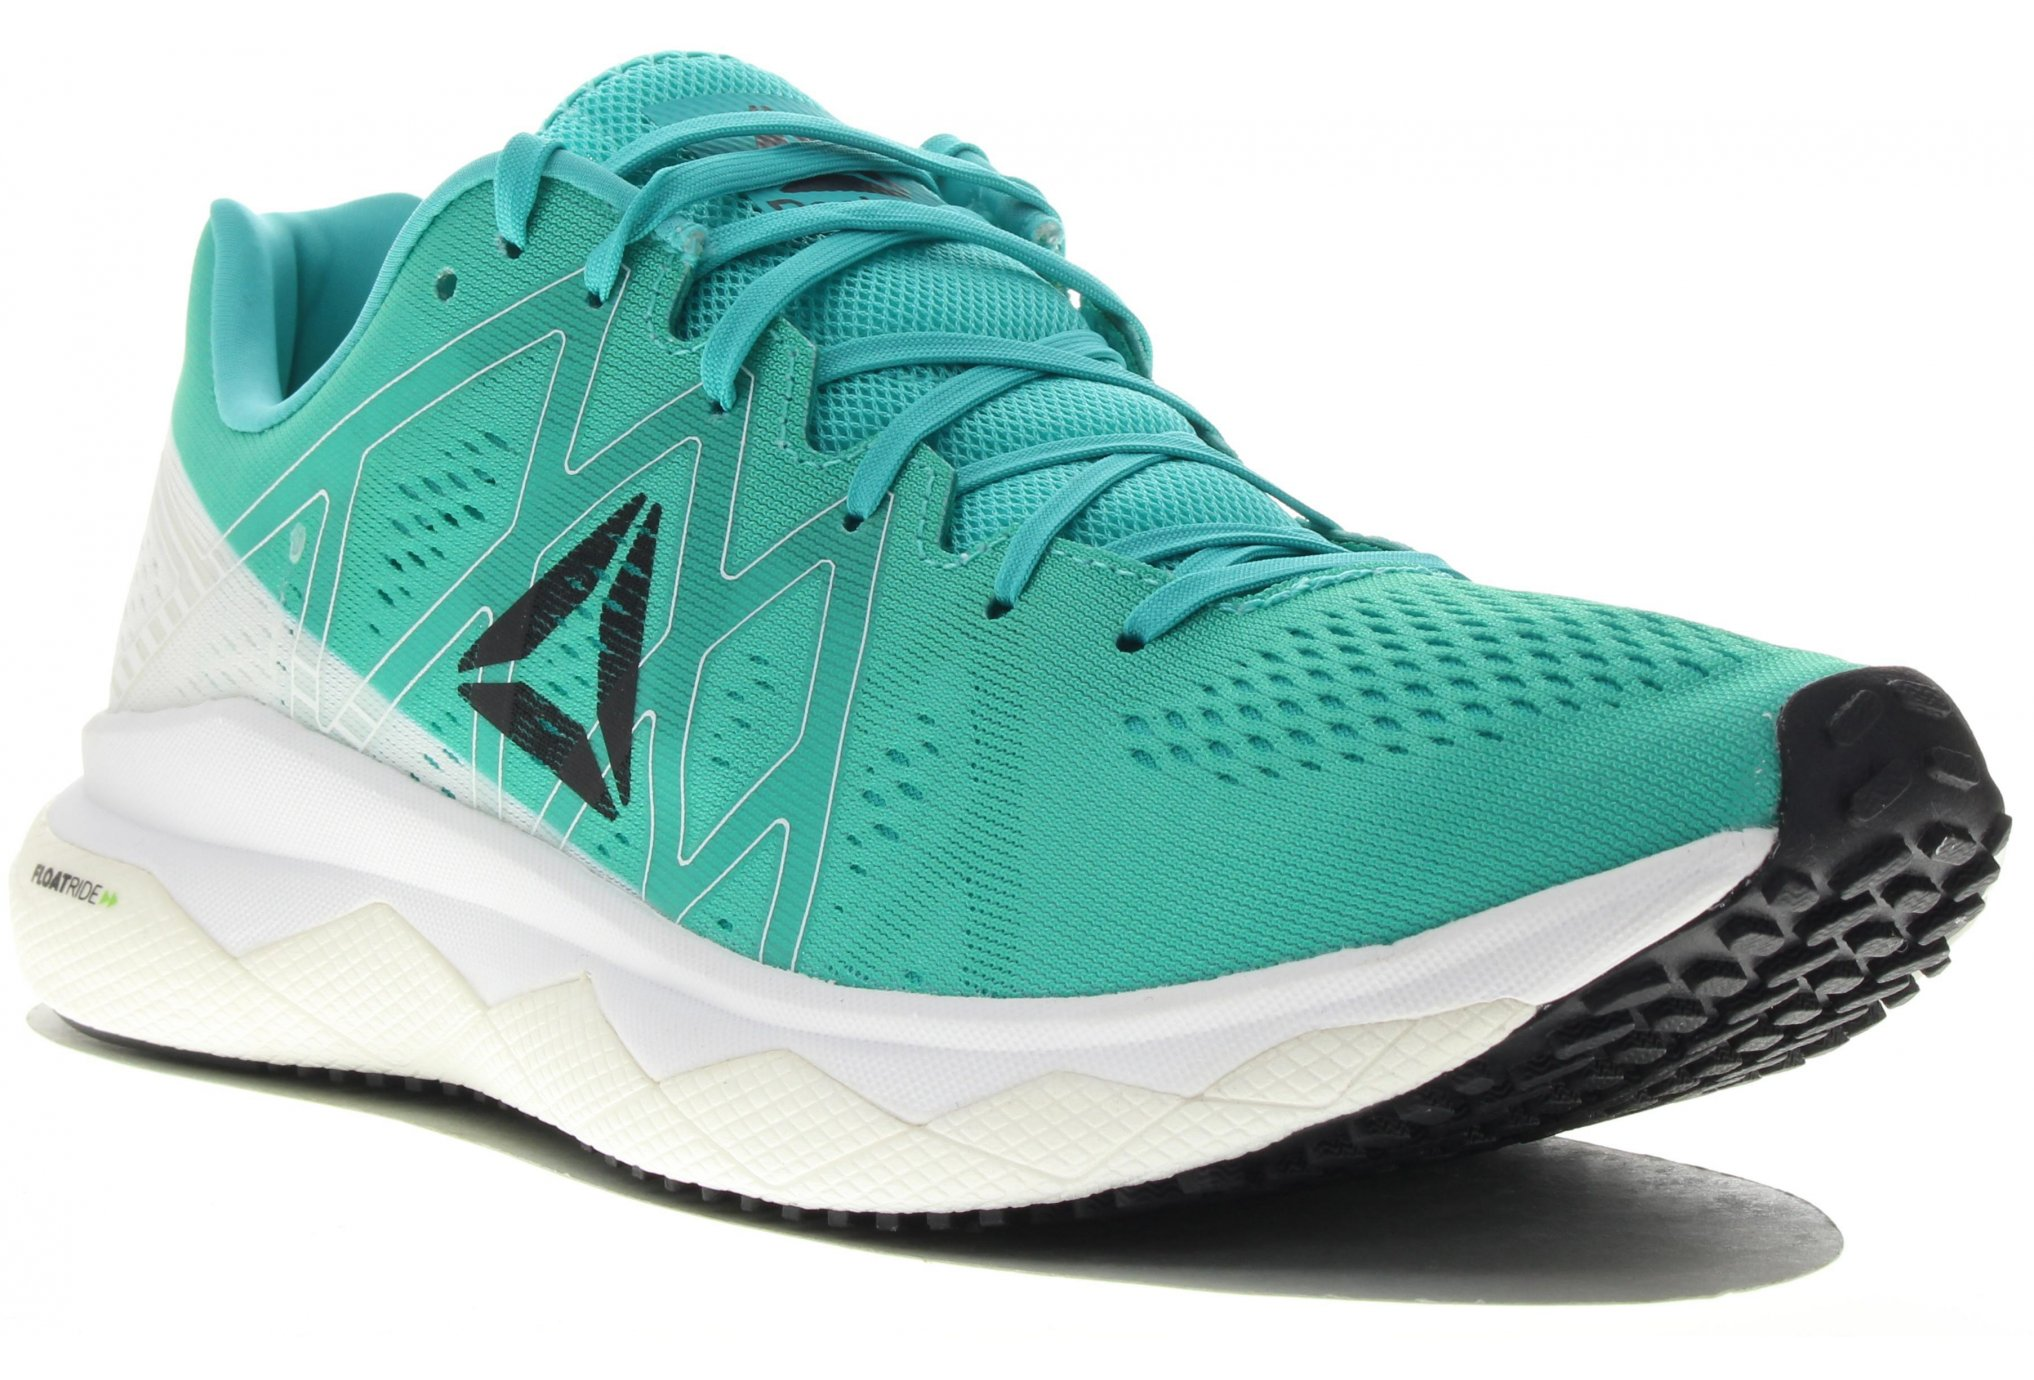 Reebok Floatride Run Fast Chaussures running femme